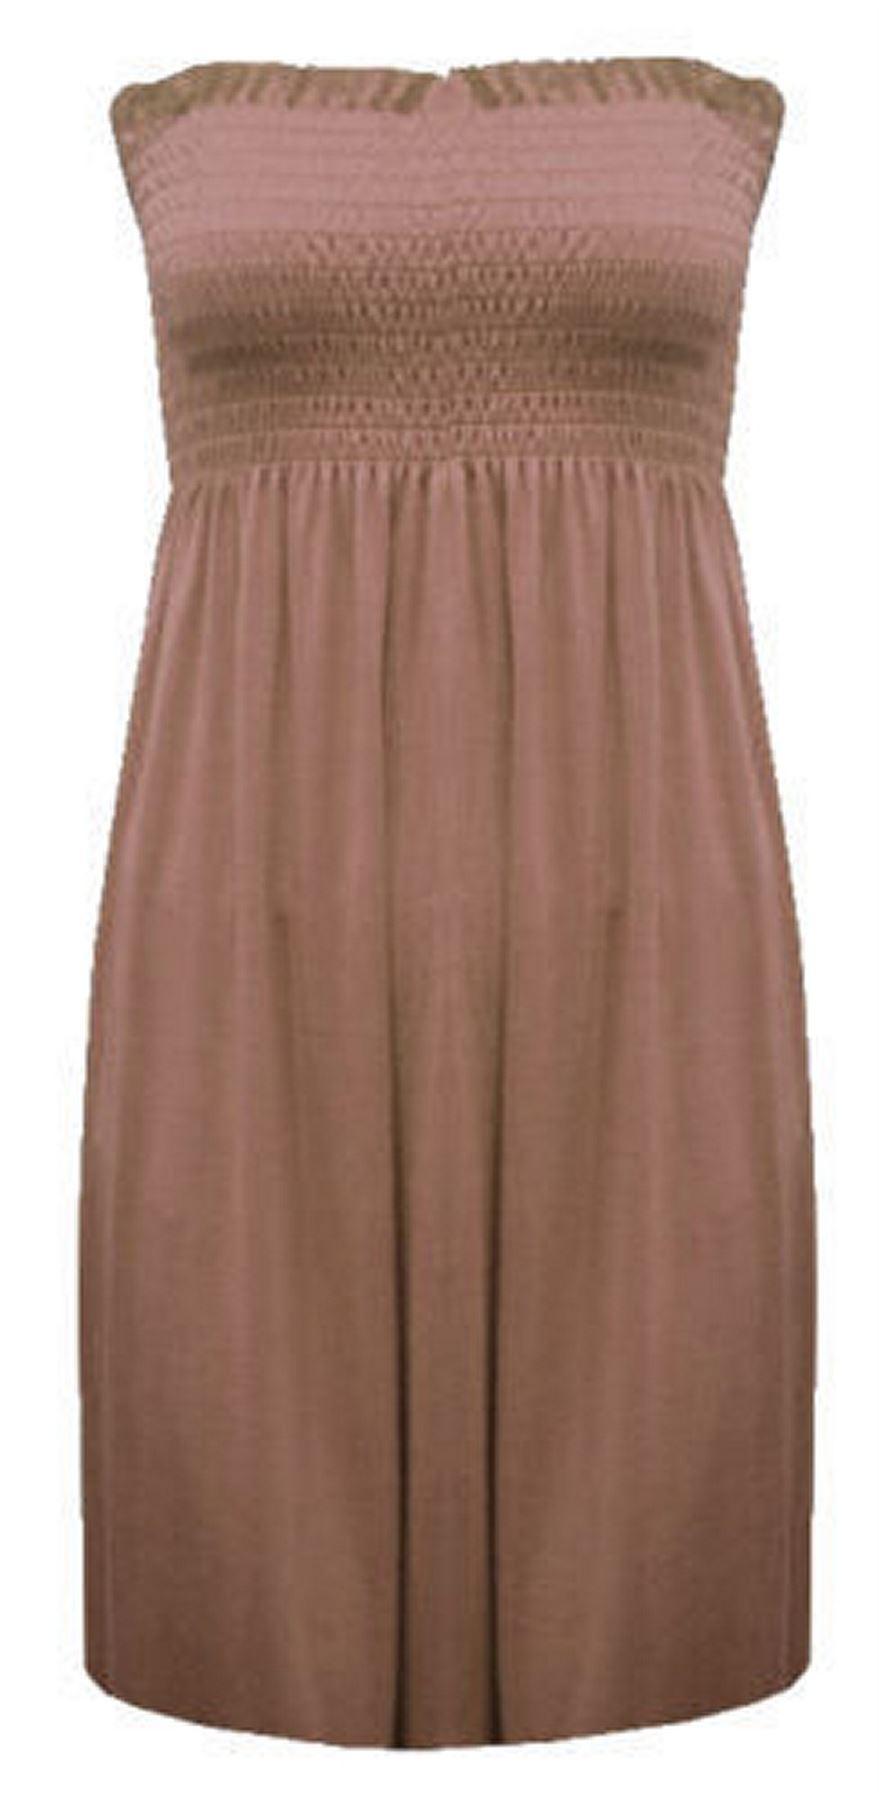 New-Ladies-Bandeau-Boob-Gathering-Tops-Boob-Tube-Beach-Wear-Tunics-8-26 thumbnail 44